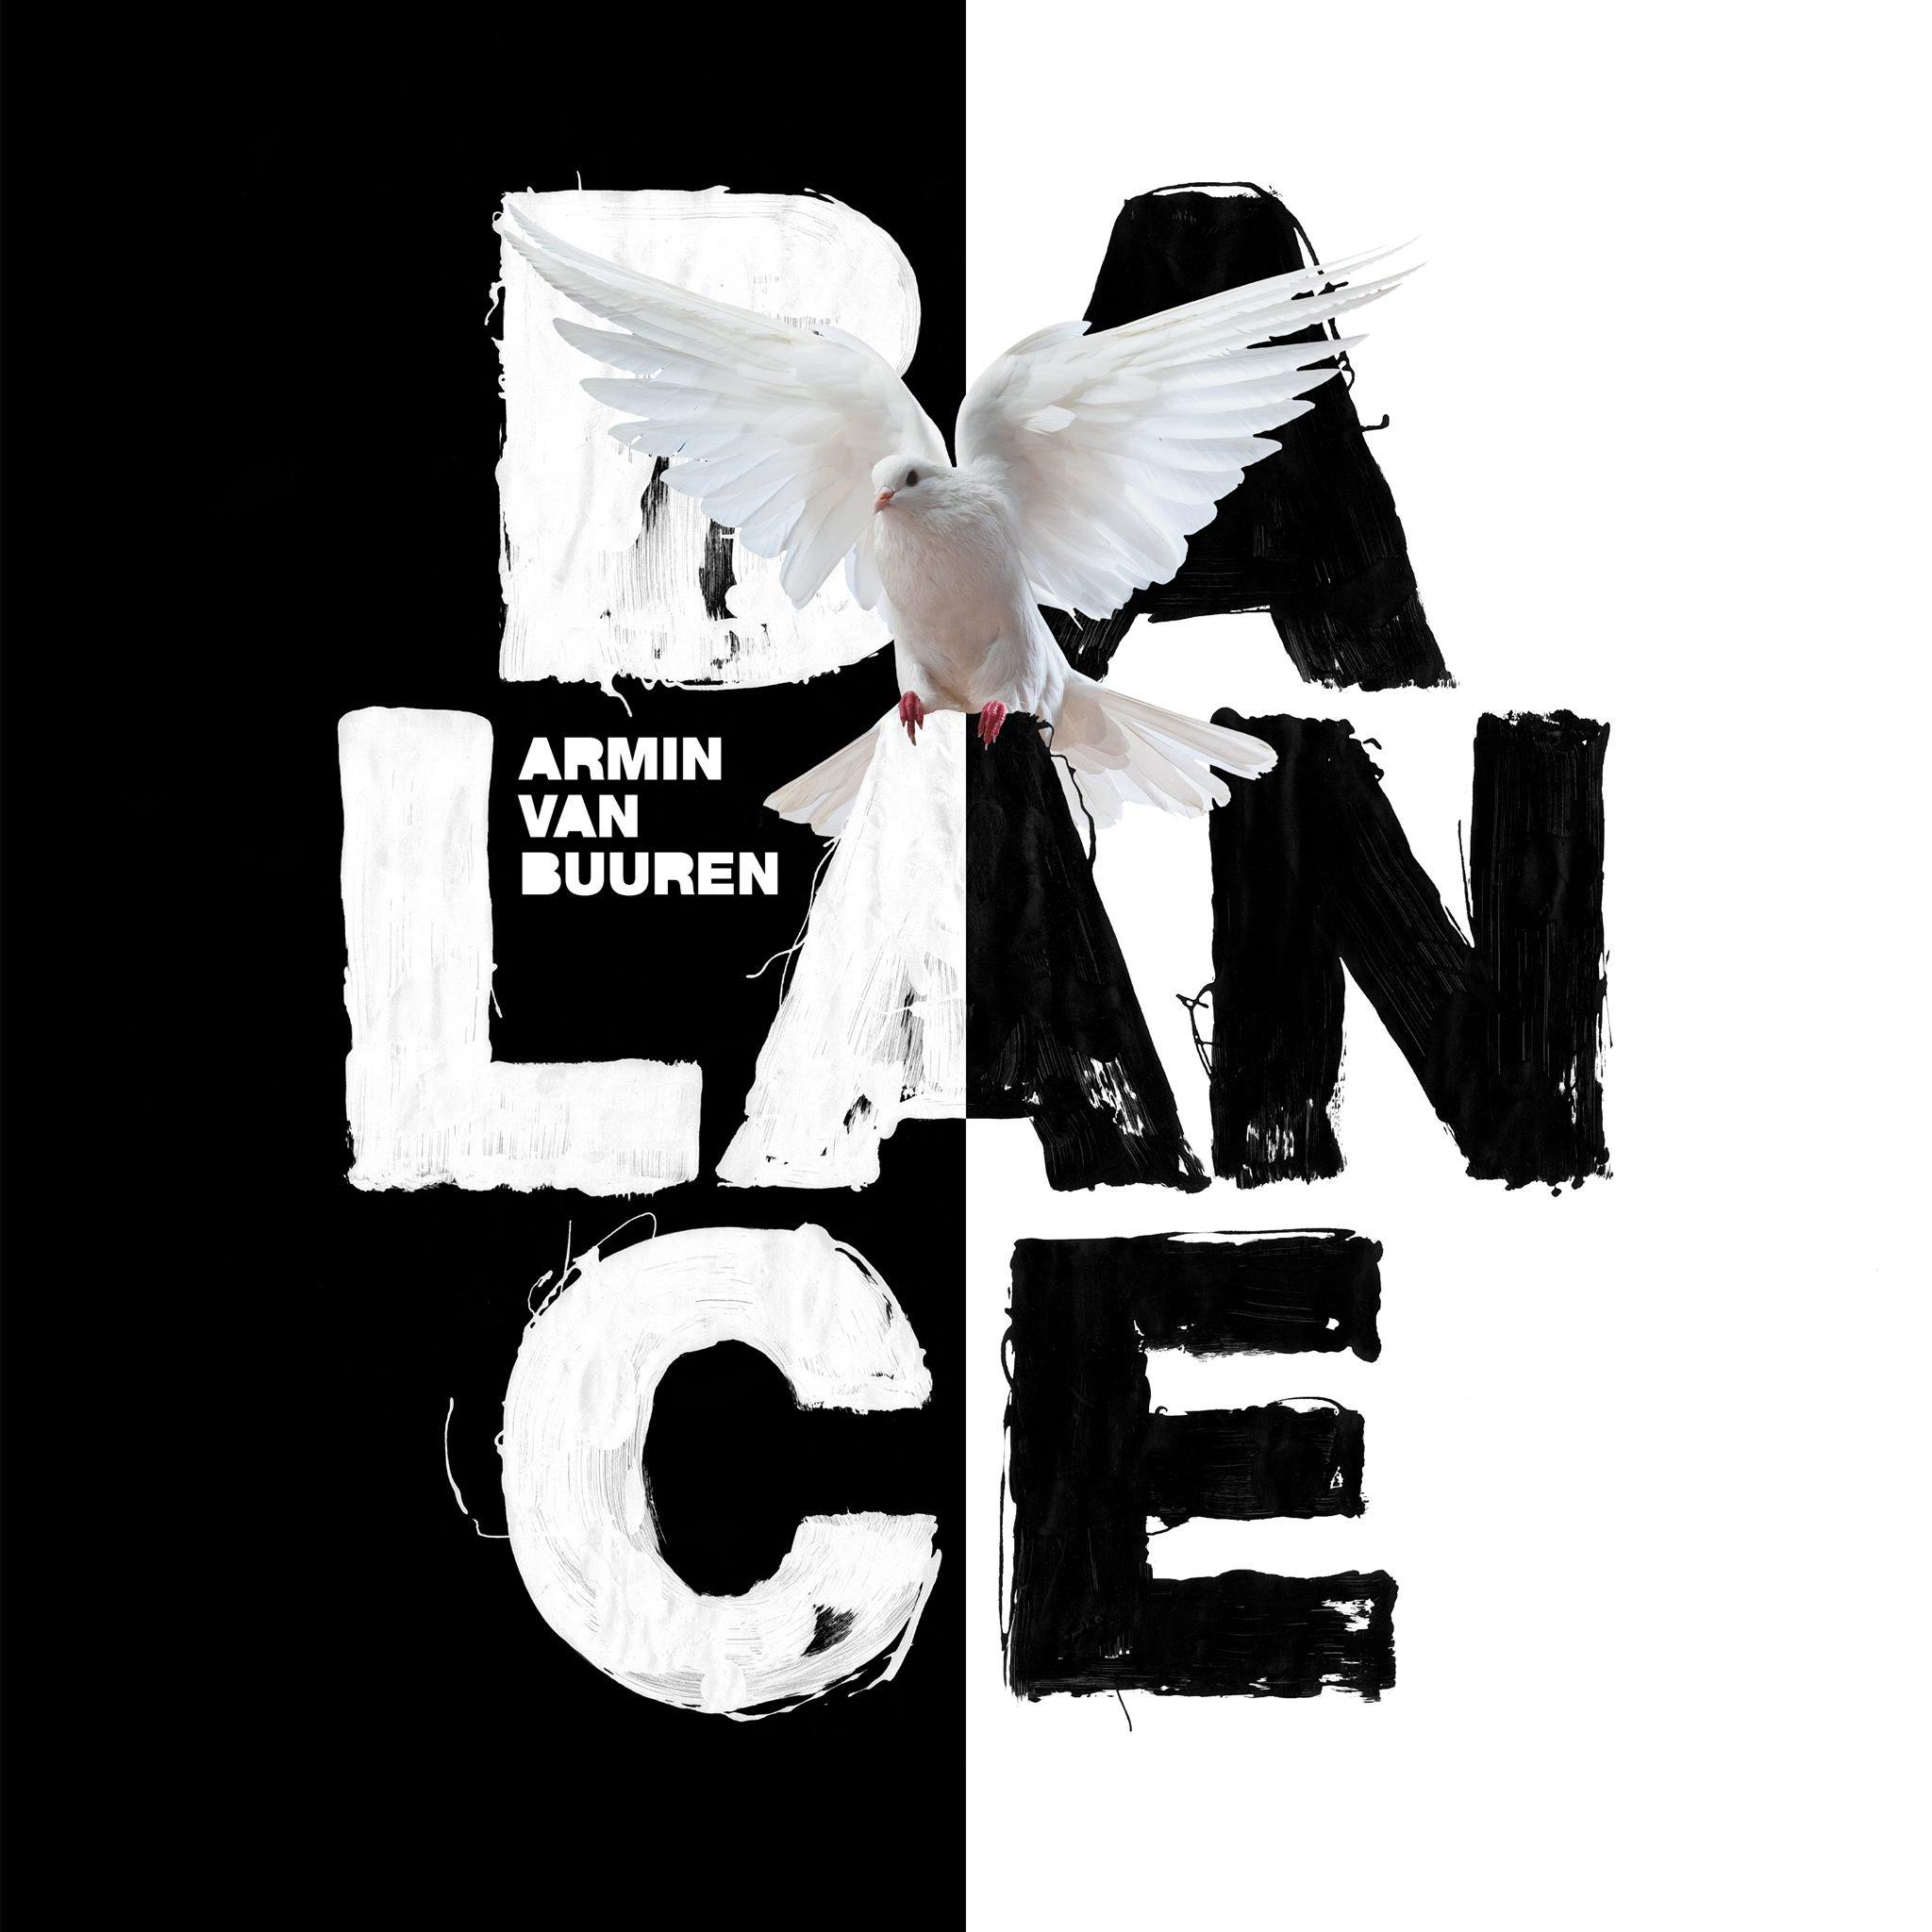 armin-van-buuren-balance-2019-album-artwork-oz-edm